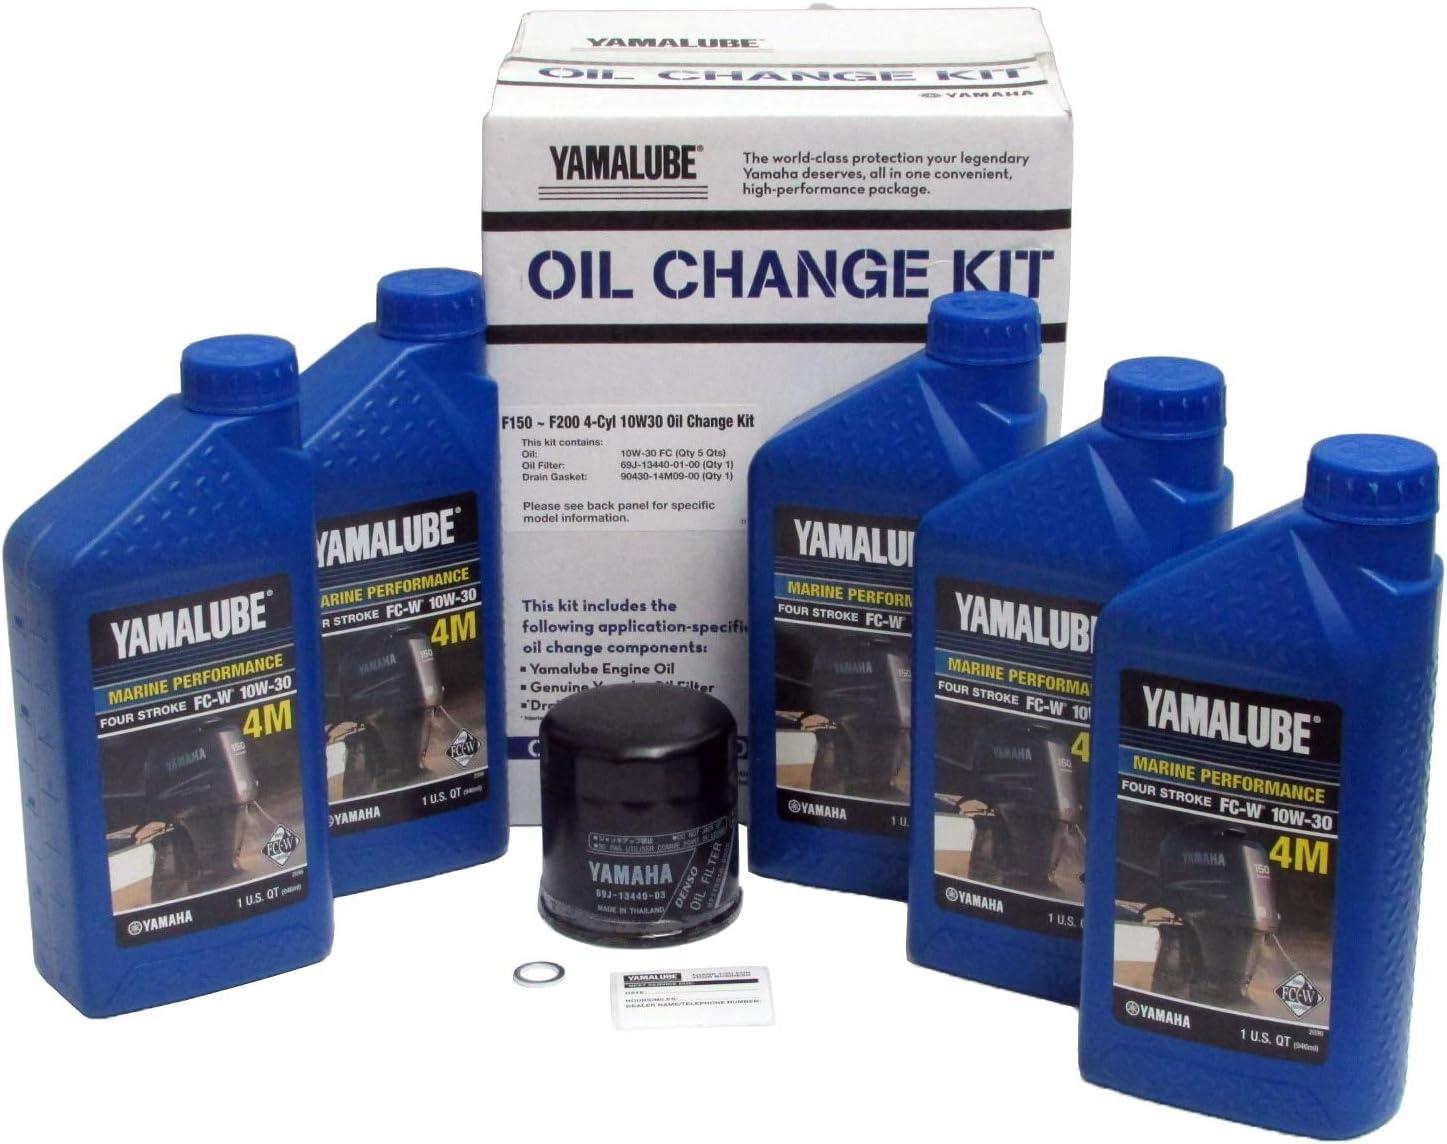 Yamahalube OEM LUB-MRNMR-KT-10 Yamaha Outboard F150 10W30 Oil Change KIT